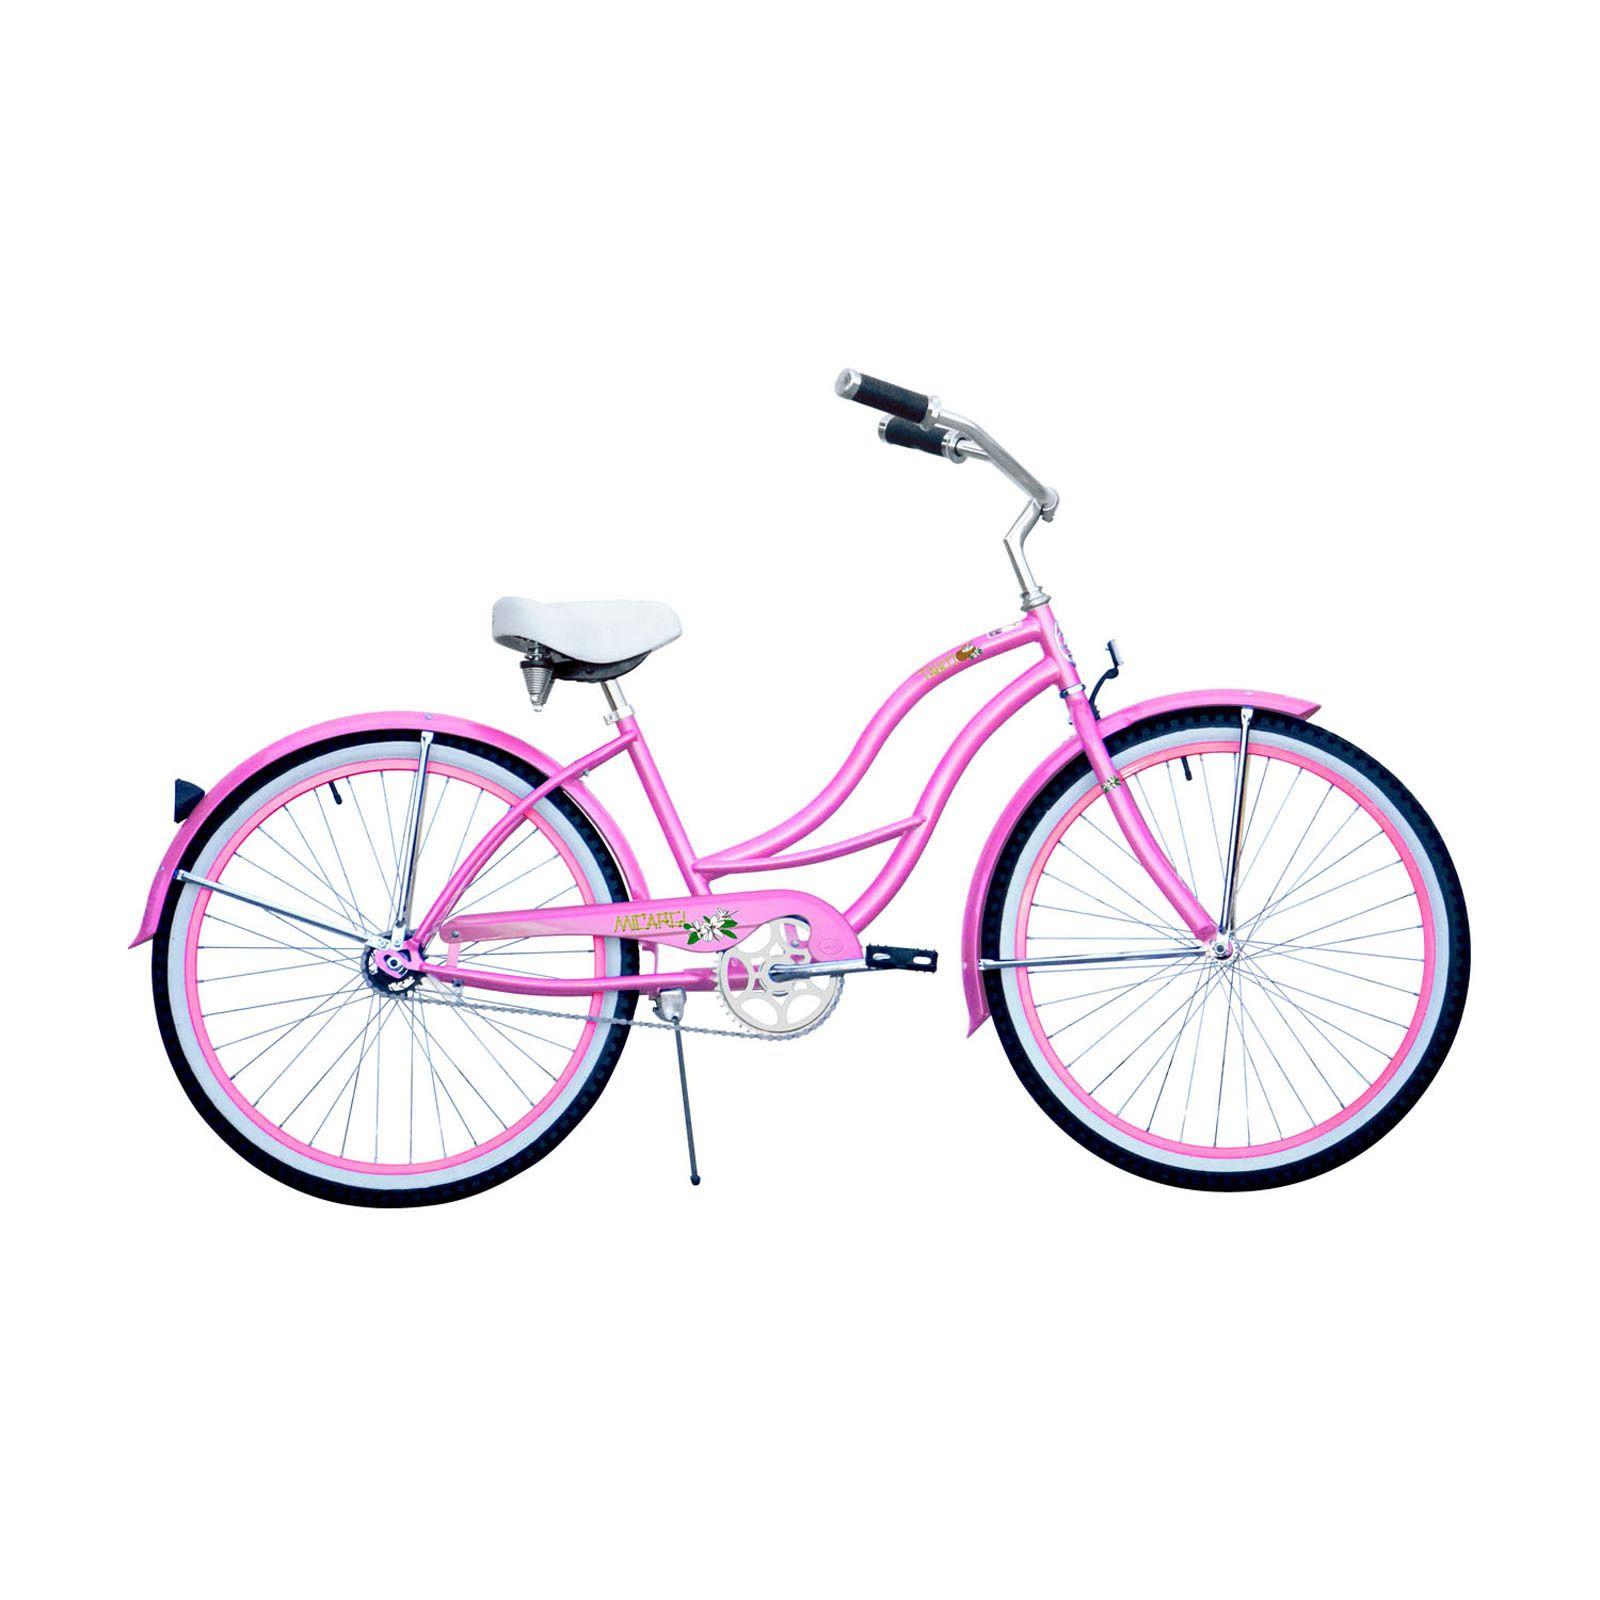 Micargi Tahiti 26-inch Pink with Pink Rim Beach Cruiser #pinkrims